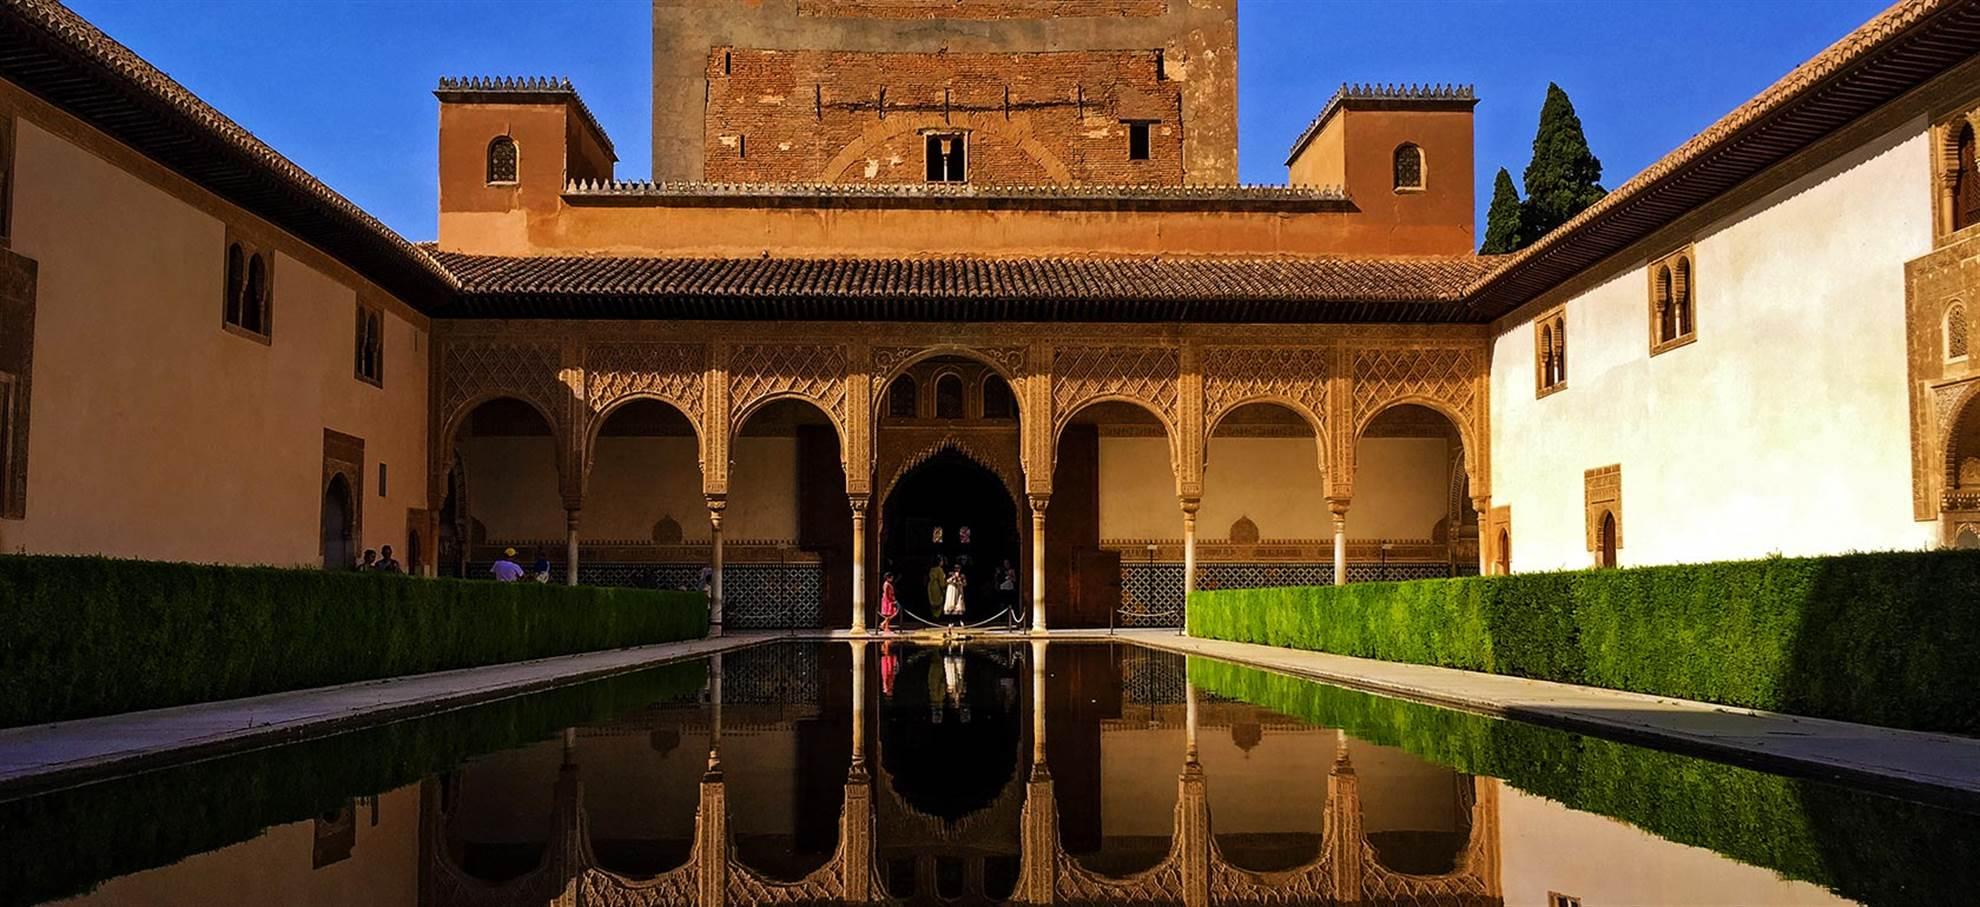 Visita Guidata Alhambra (guida inglese)